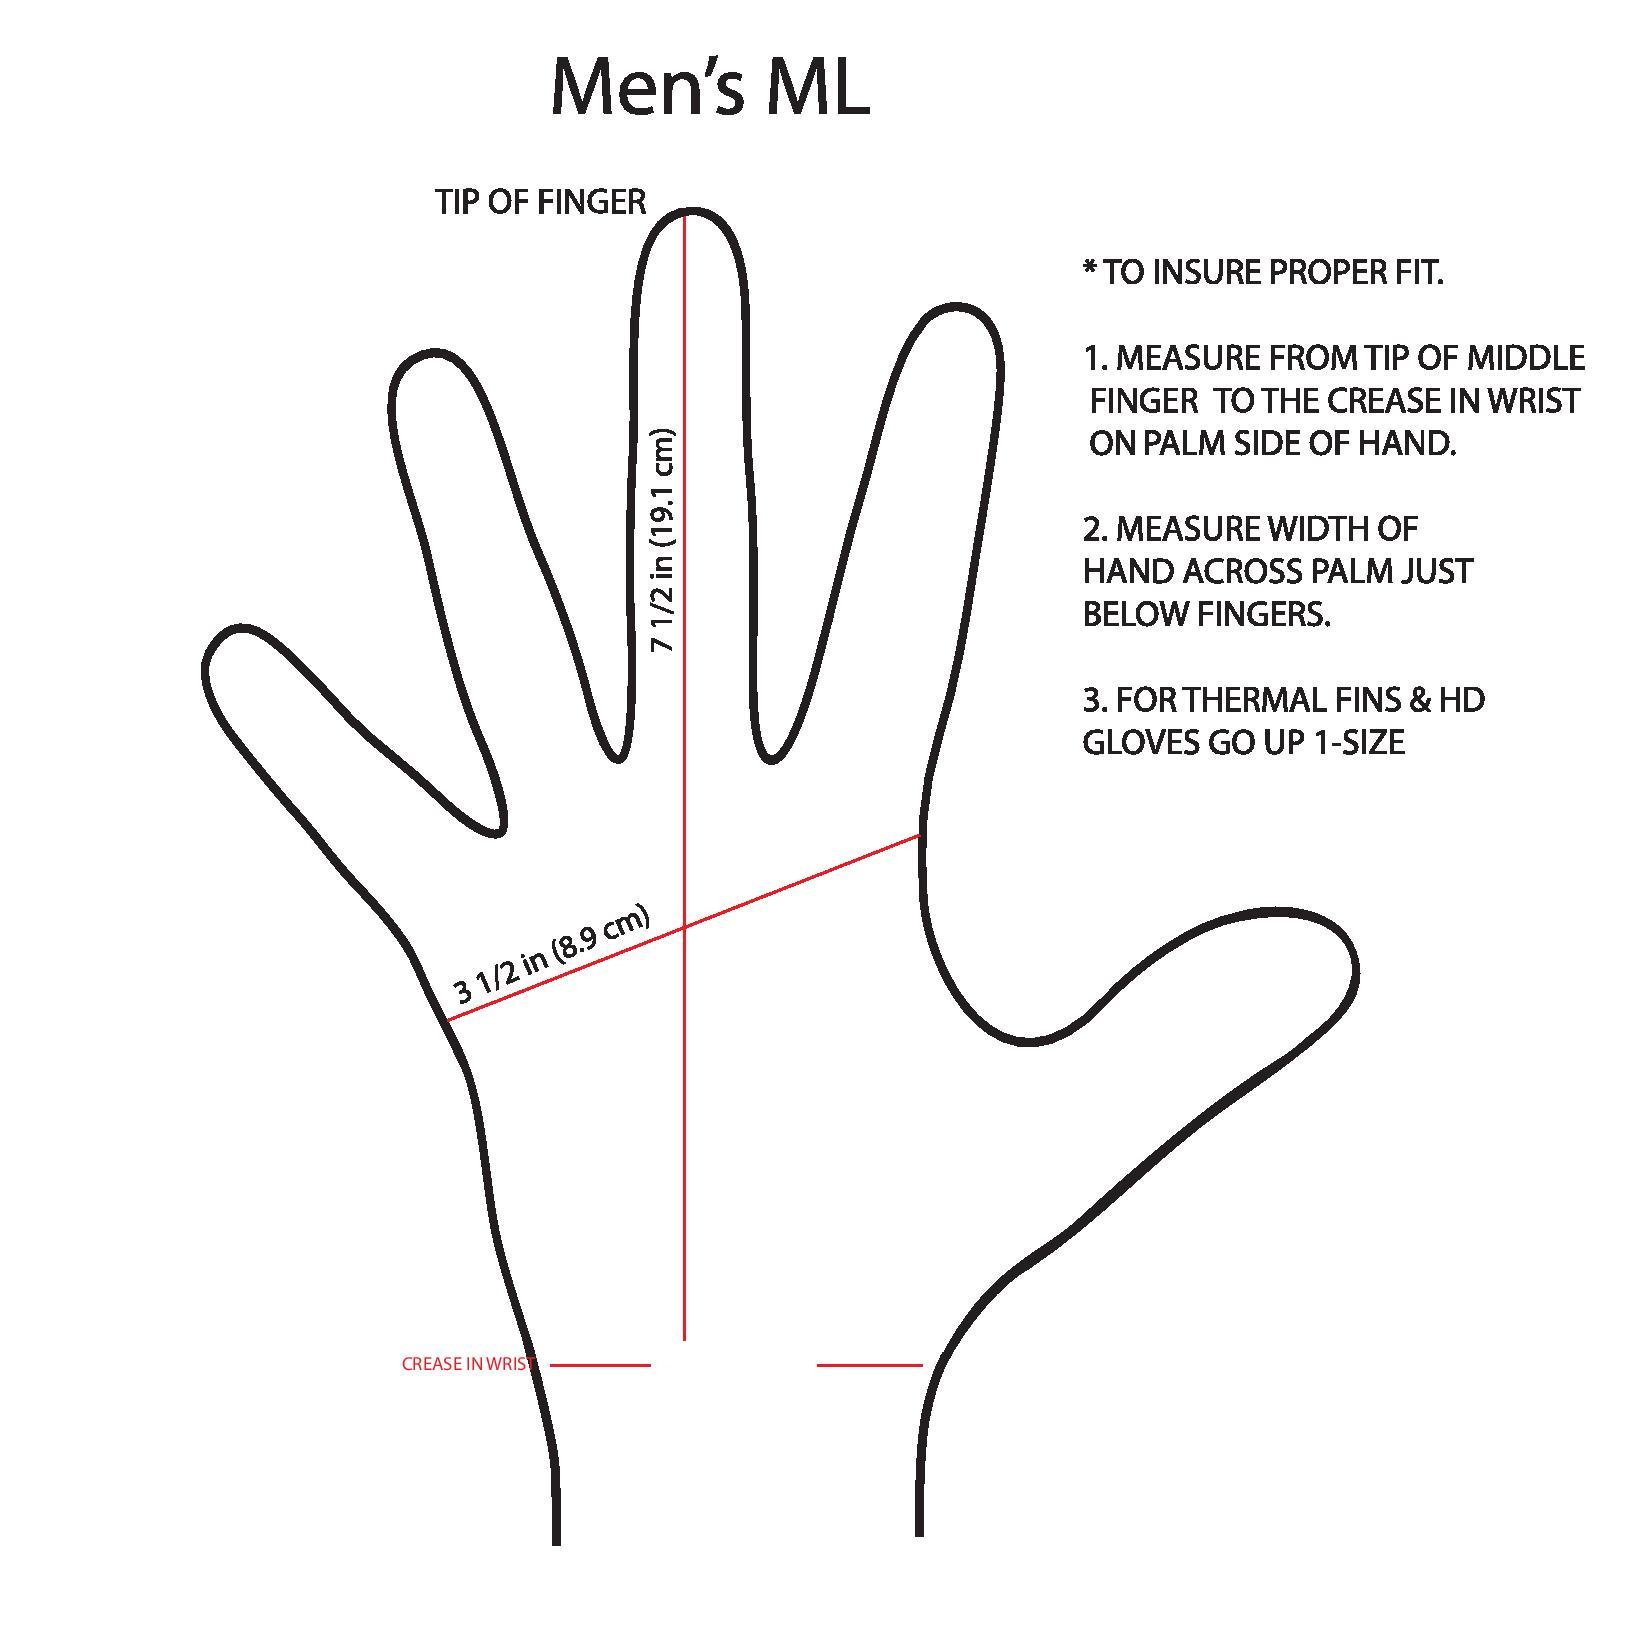 men-s-ml-page-001-2-.jpg